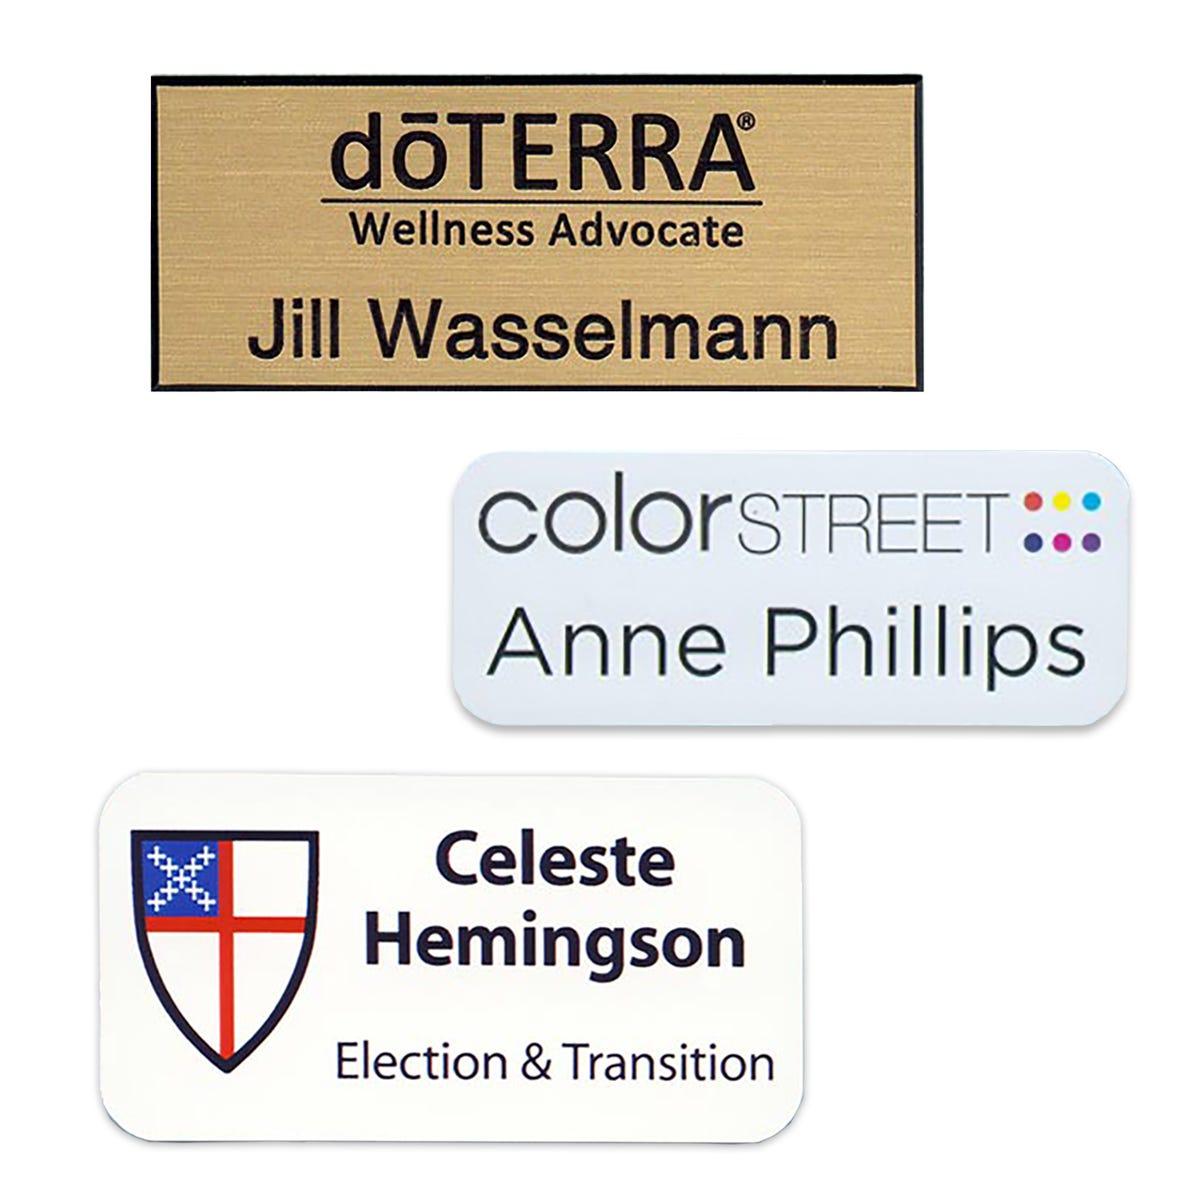 Pre-Logoed Name Tags